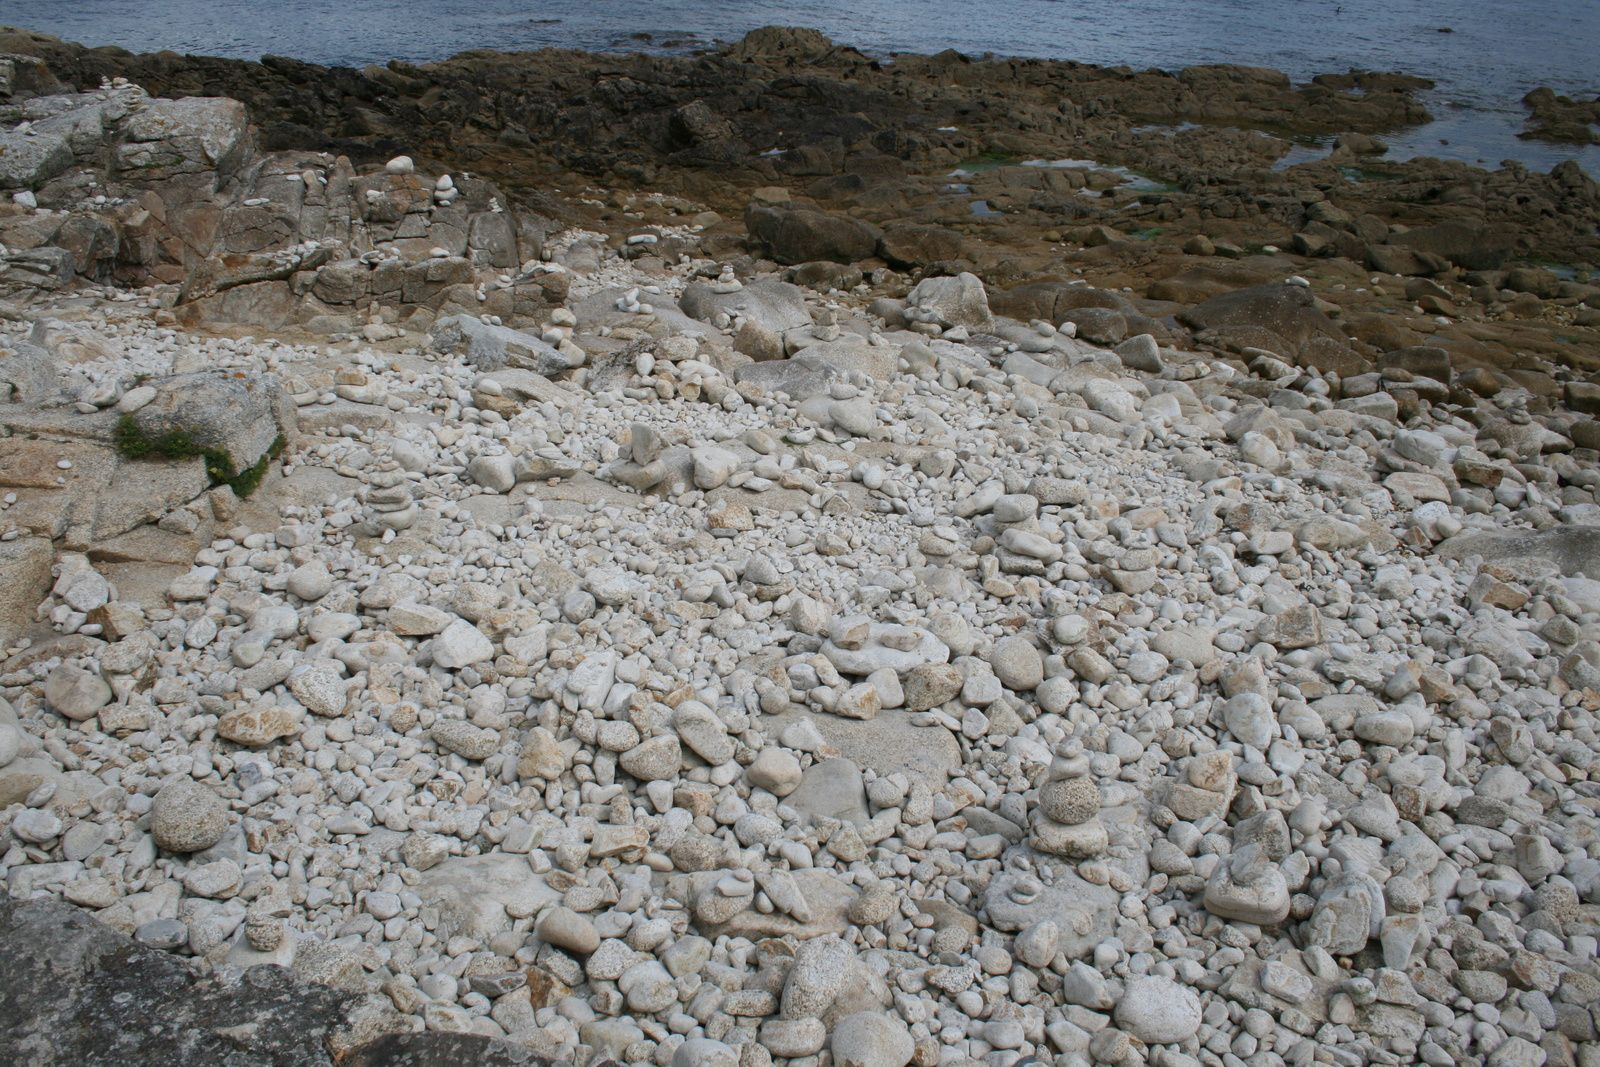 #cailloux #plage de galets #saintemarine #bretagne #france #charlotteblabla blog